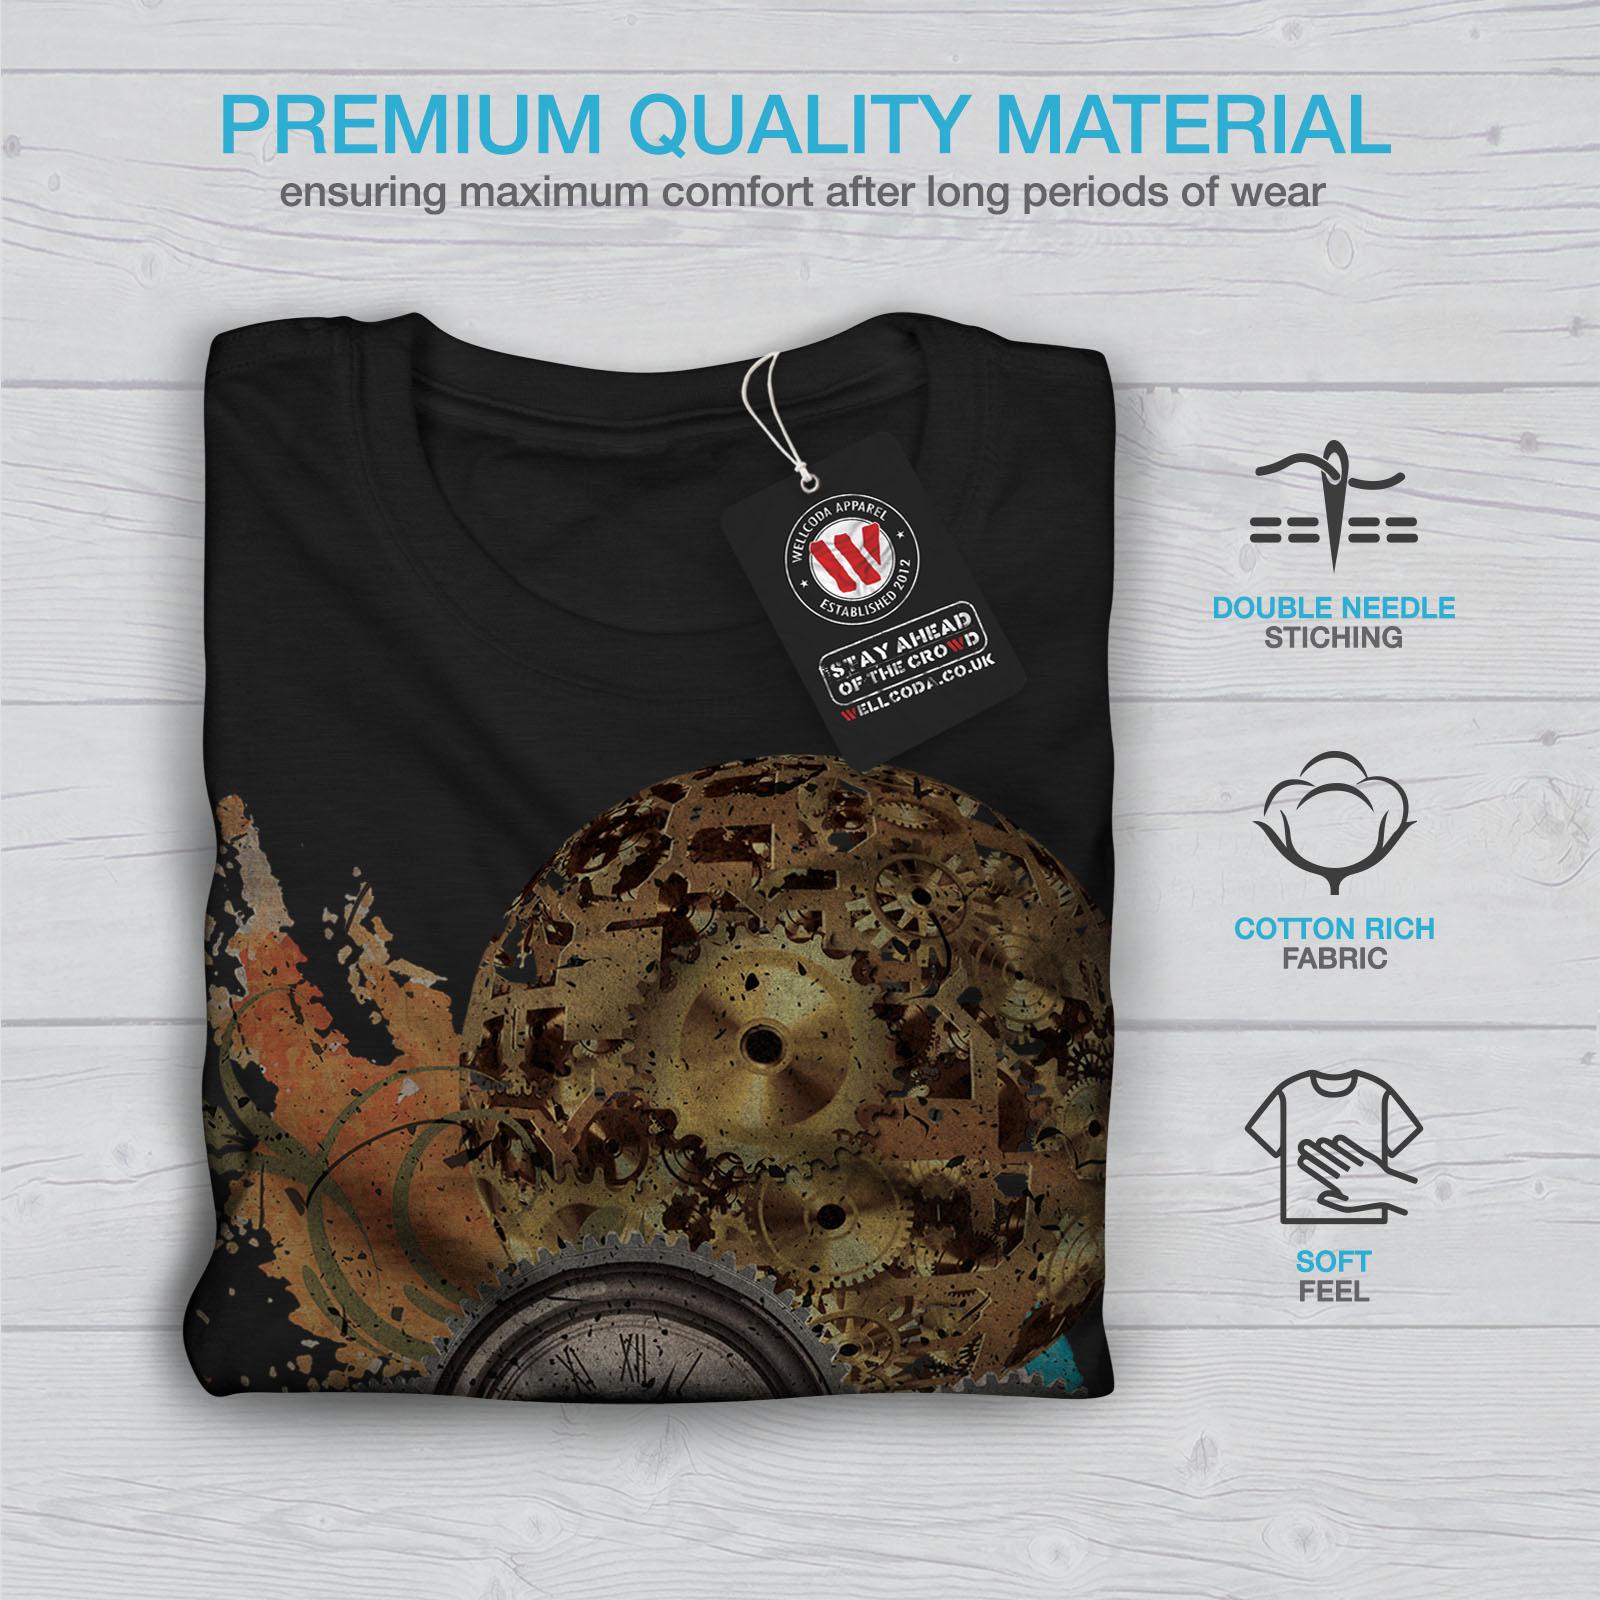 Wellcoda-Clock-Cool-Print-Mens-T-shirt-Illusion-Graphic-Design-Printed-Tee thumbnail 7